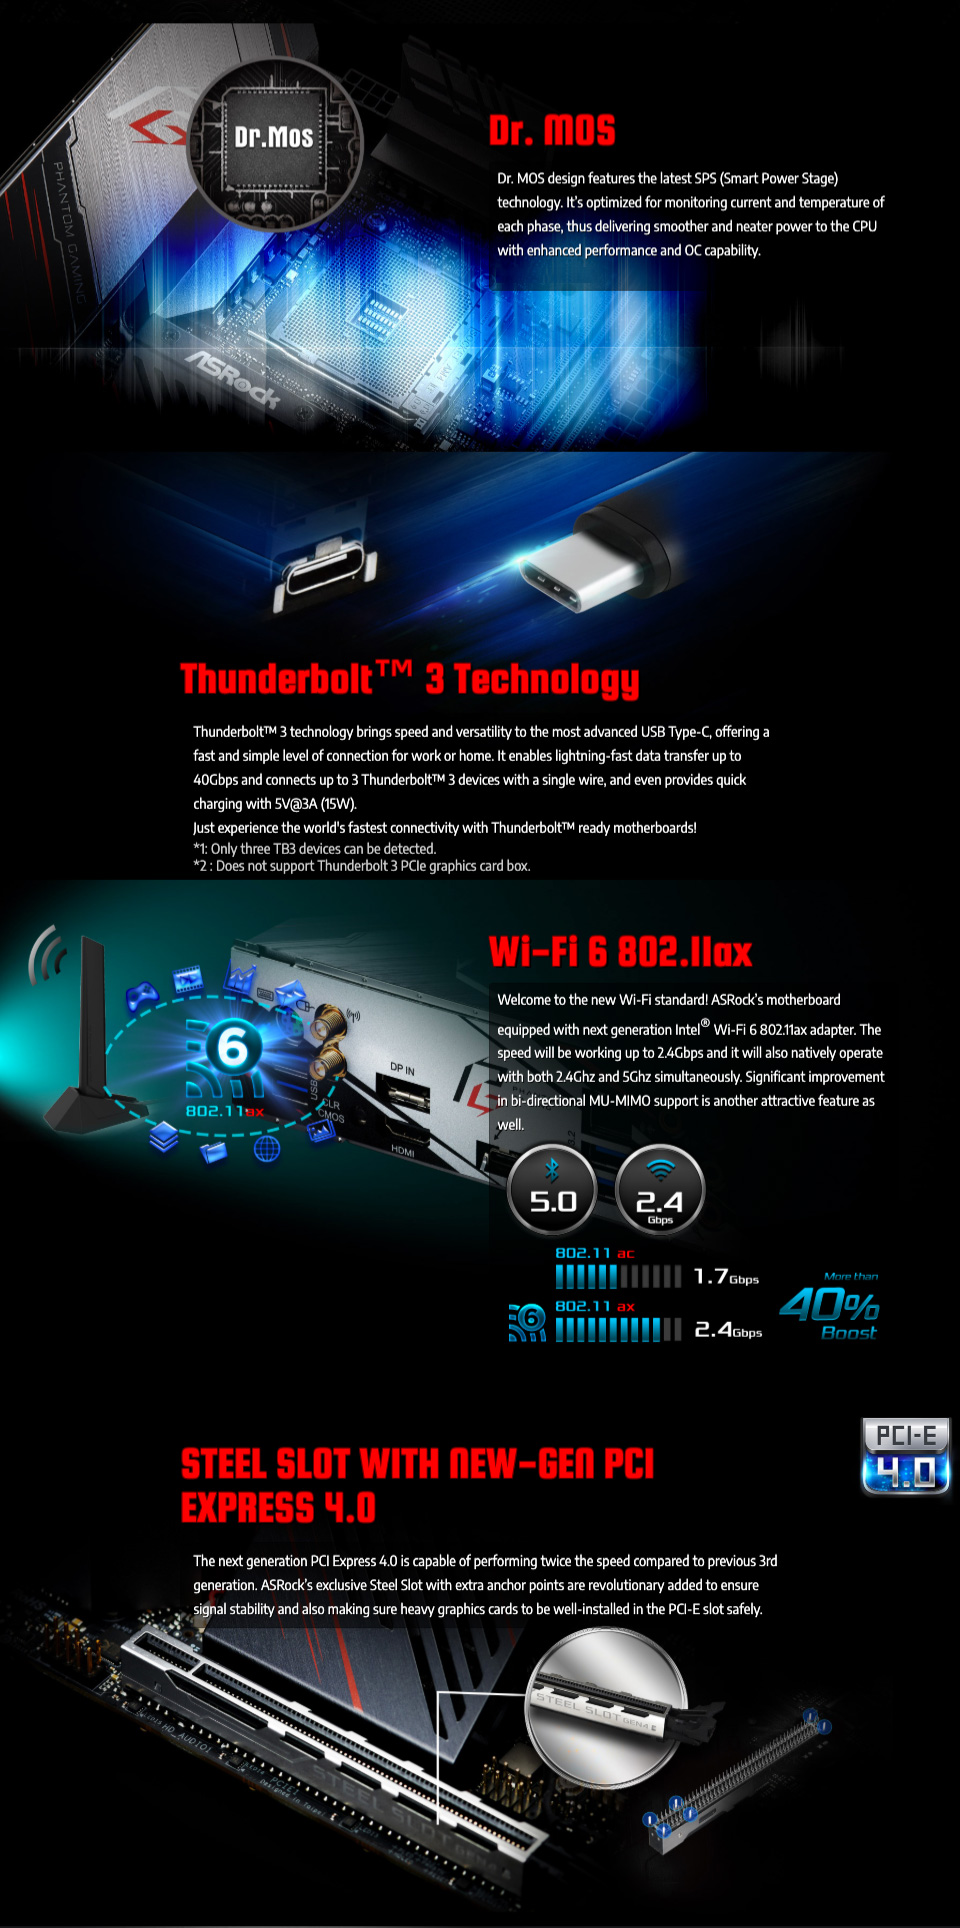 ASRock X570 Phantom Gaming ITX/TB3 Motherboard features 2